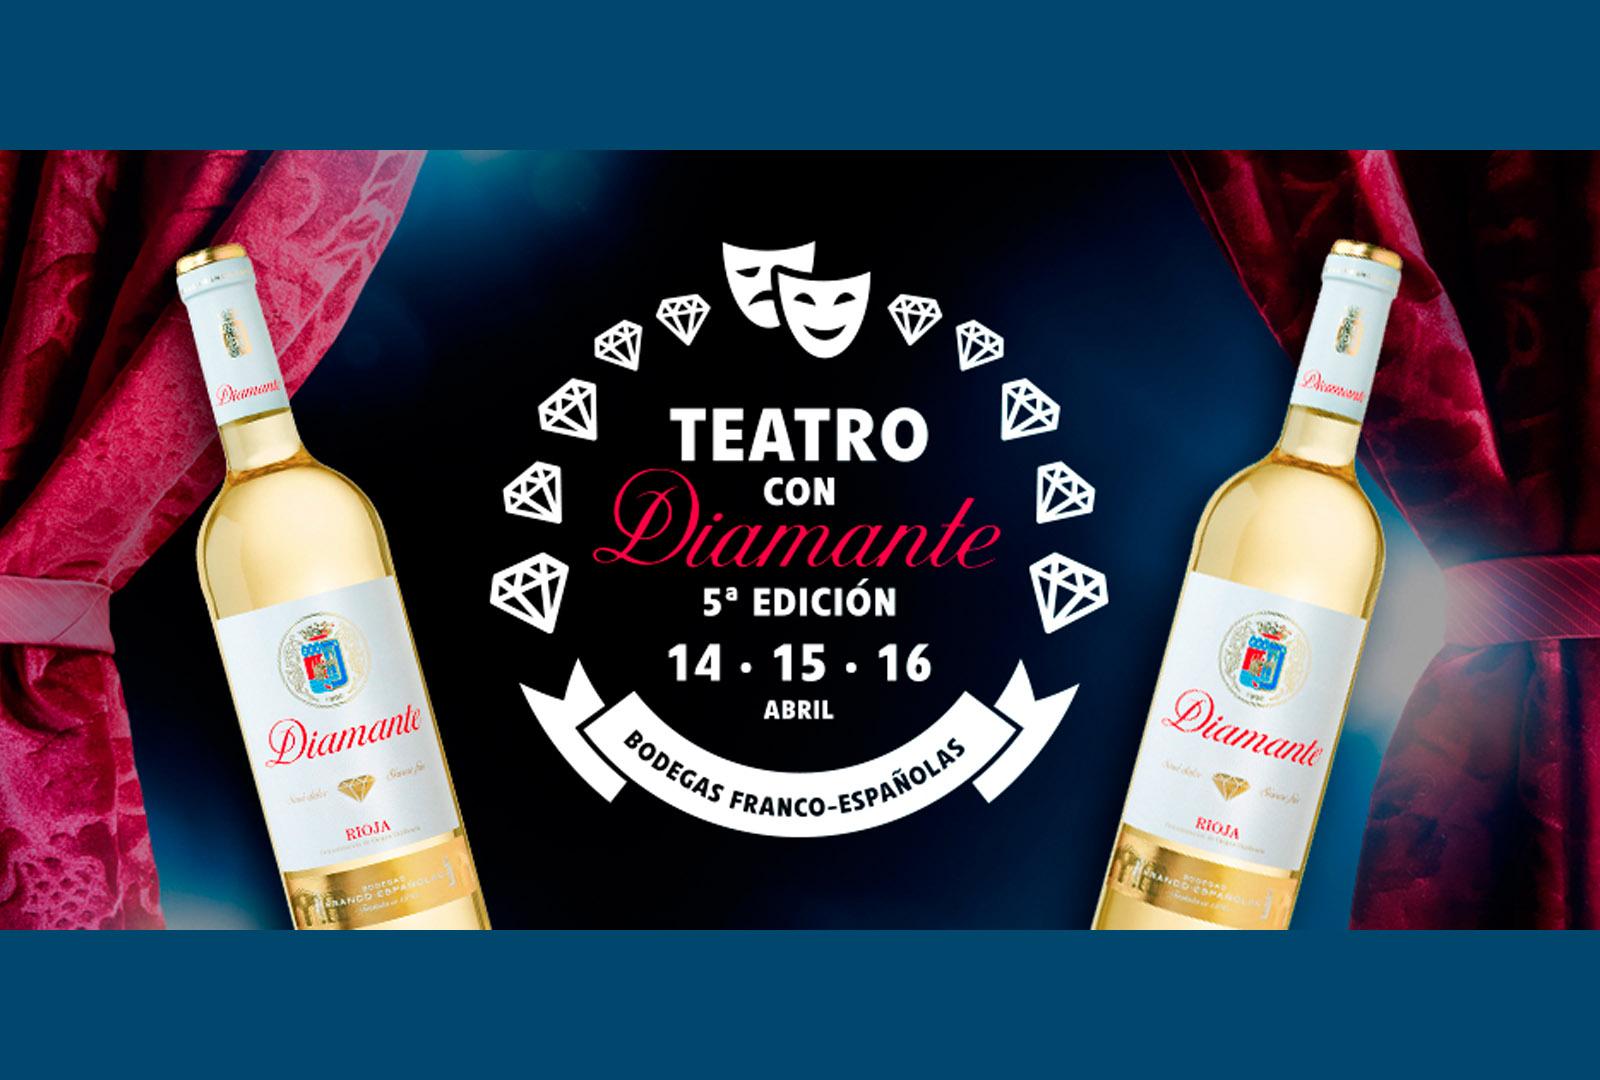 Teatro con diamante en Bodegas Franco-Españolas.